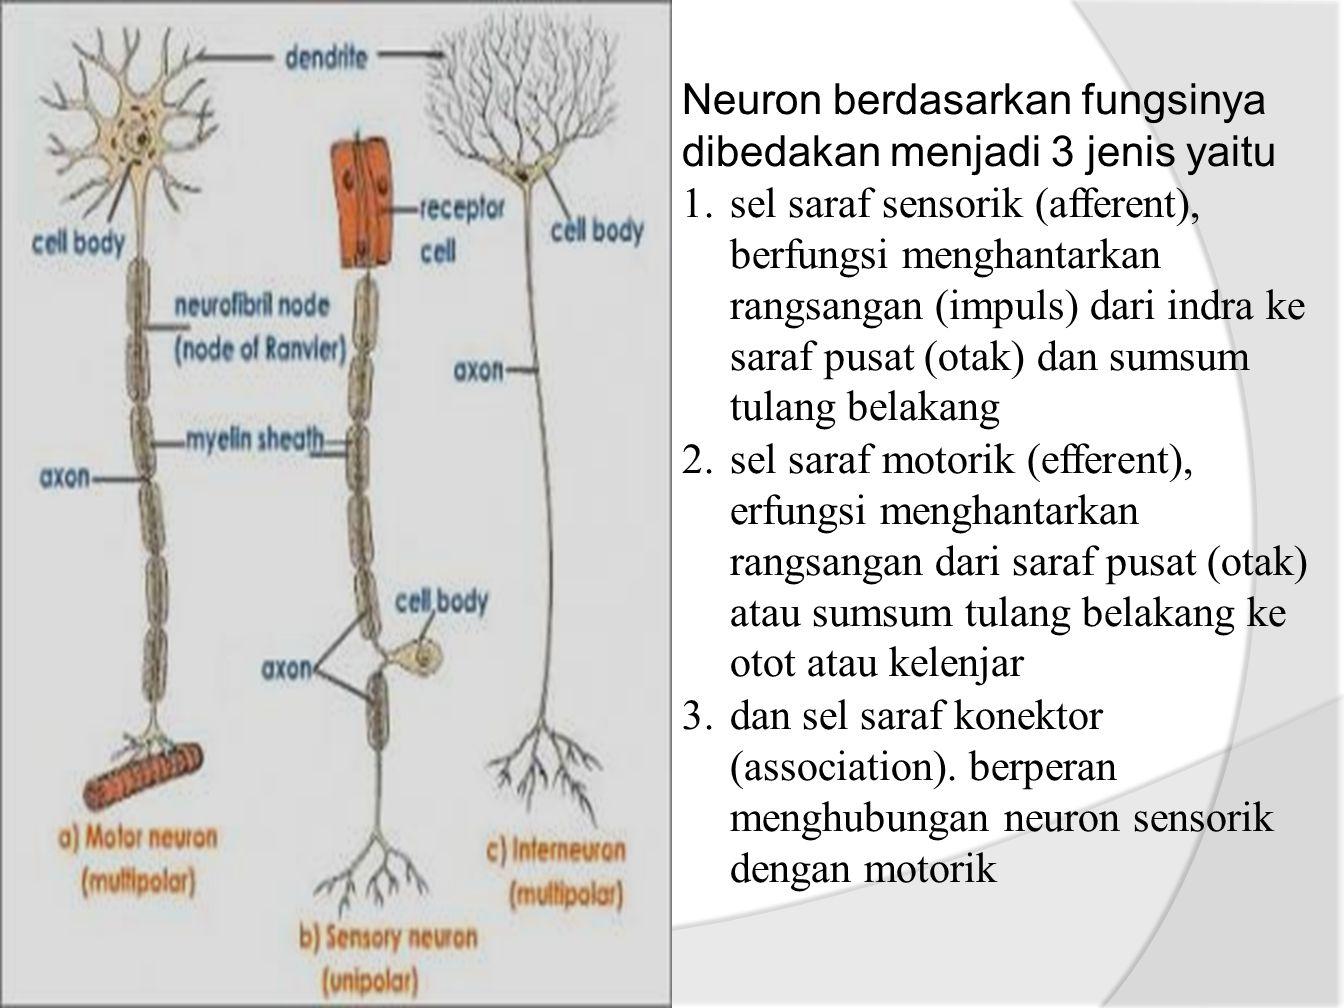 Neuron berdasarkan fungsinya dibedakan menjadi 3 jenis yaitu 1.sel saraf sensorik (afferent), berfungsi menghantarkan rangsangan (impuls) dari indra ke saraf pusat (otak) dan sumsum tulang belakang 2.sel saraf motorik (efferent), erfungsi menghantarkan rangsangan dari saraf pusat (otak) atau sumsum tulang belakang ke otot atau kelenjar 3.dan sel saraf konektor (association).